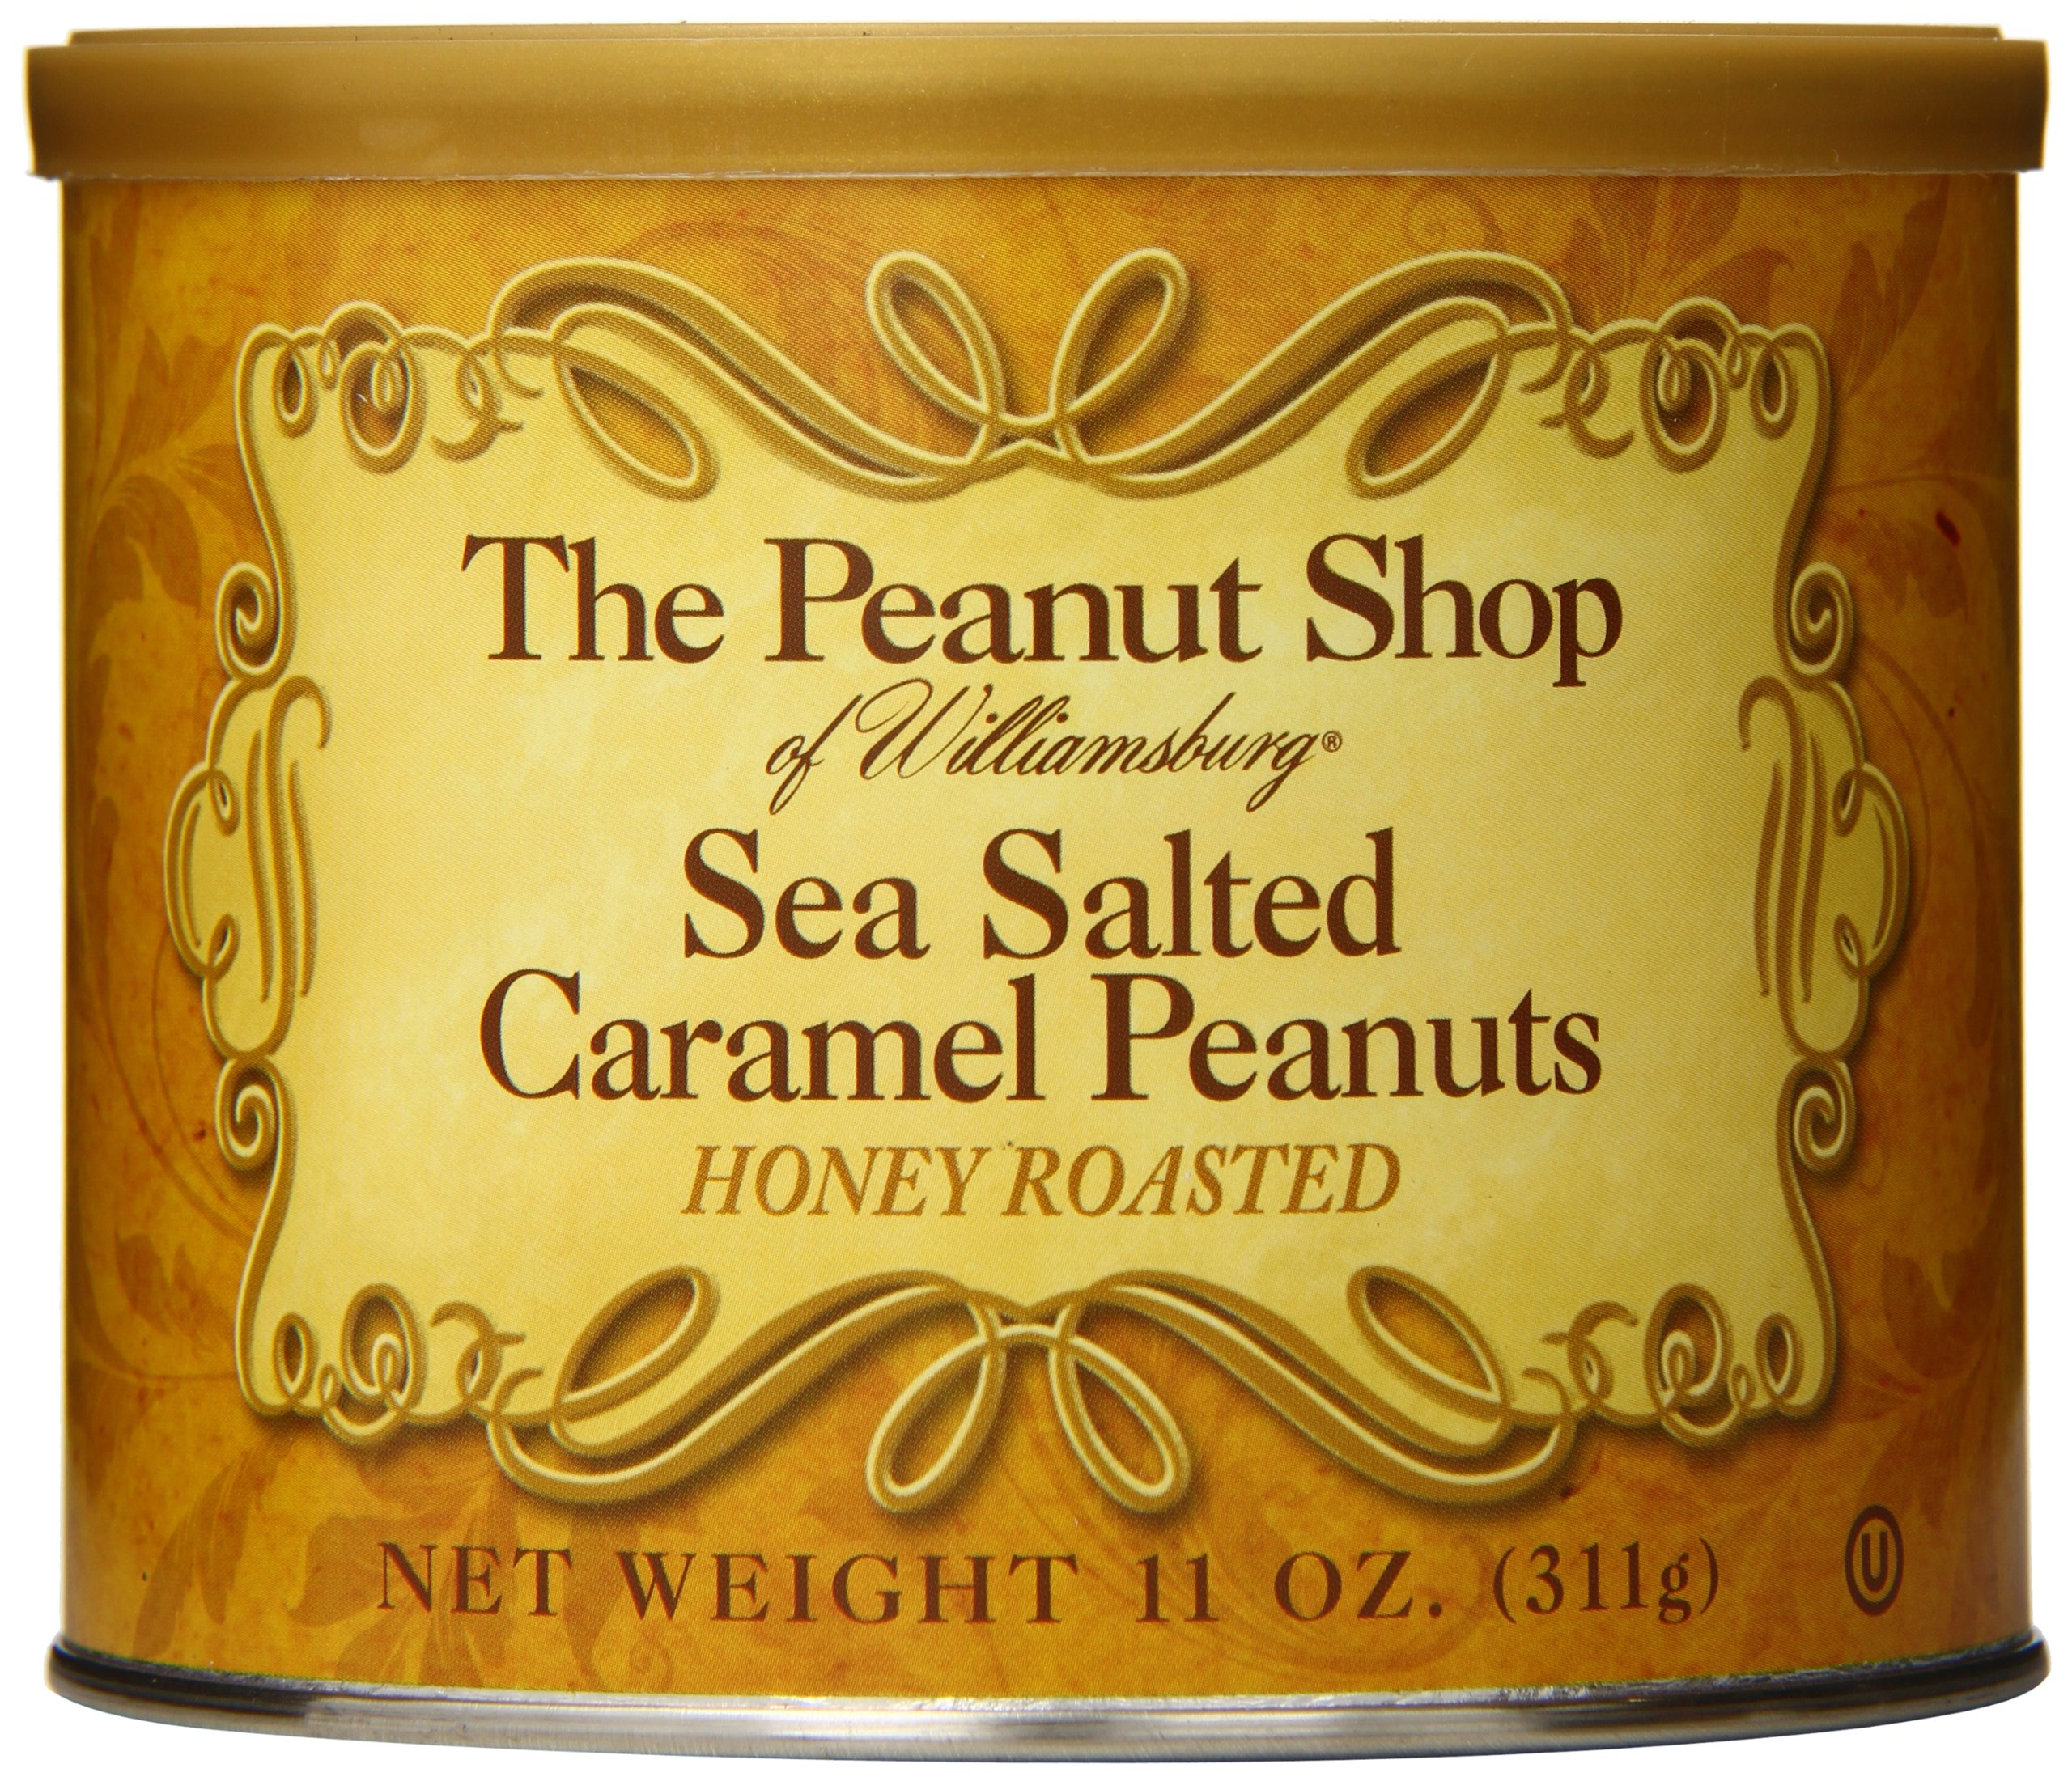 The Peanut Shop of Williamsburg Honey Roasted Peanut Tin, Sea Salt Caramel, 11 Ounce